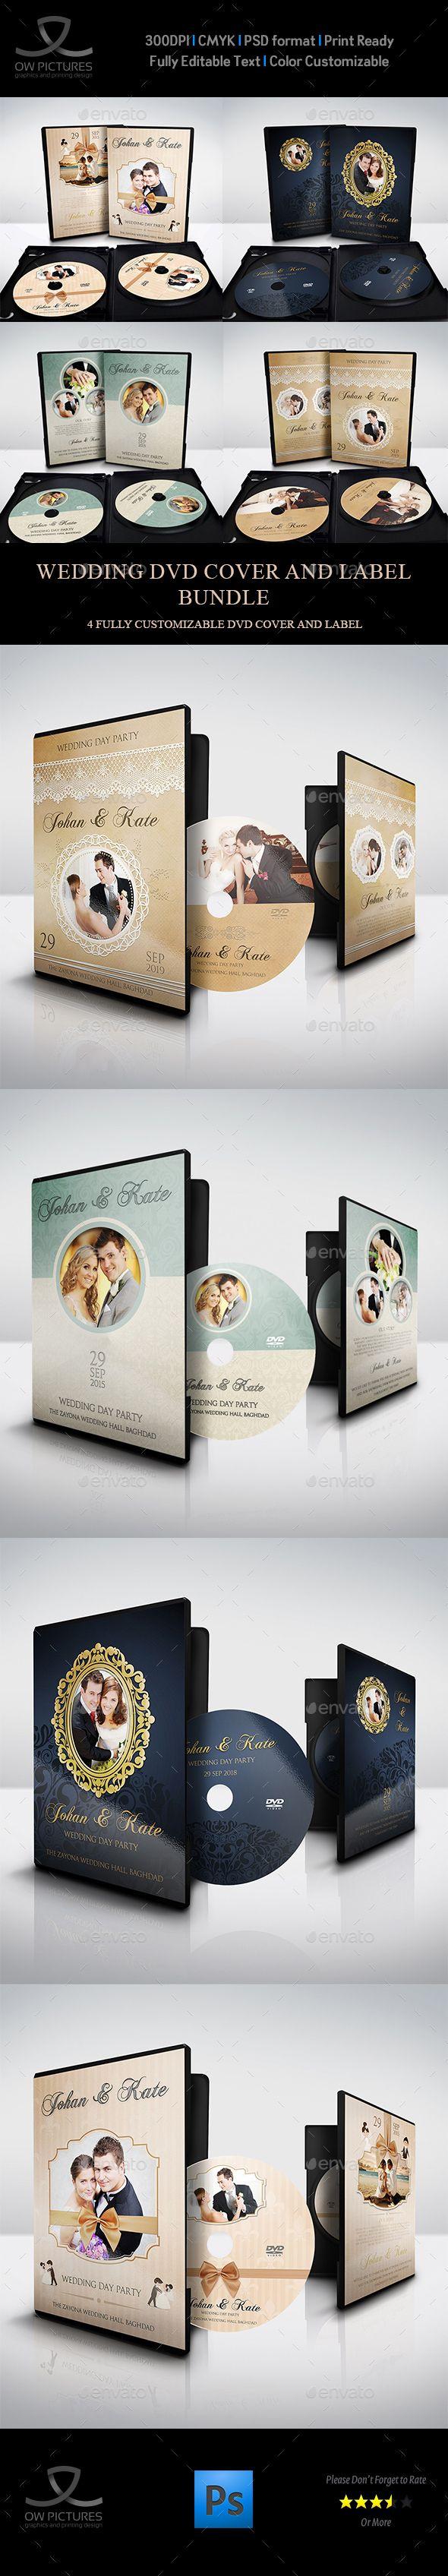 dvd case label templates - Forte.euforic.co